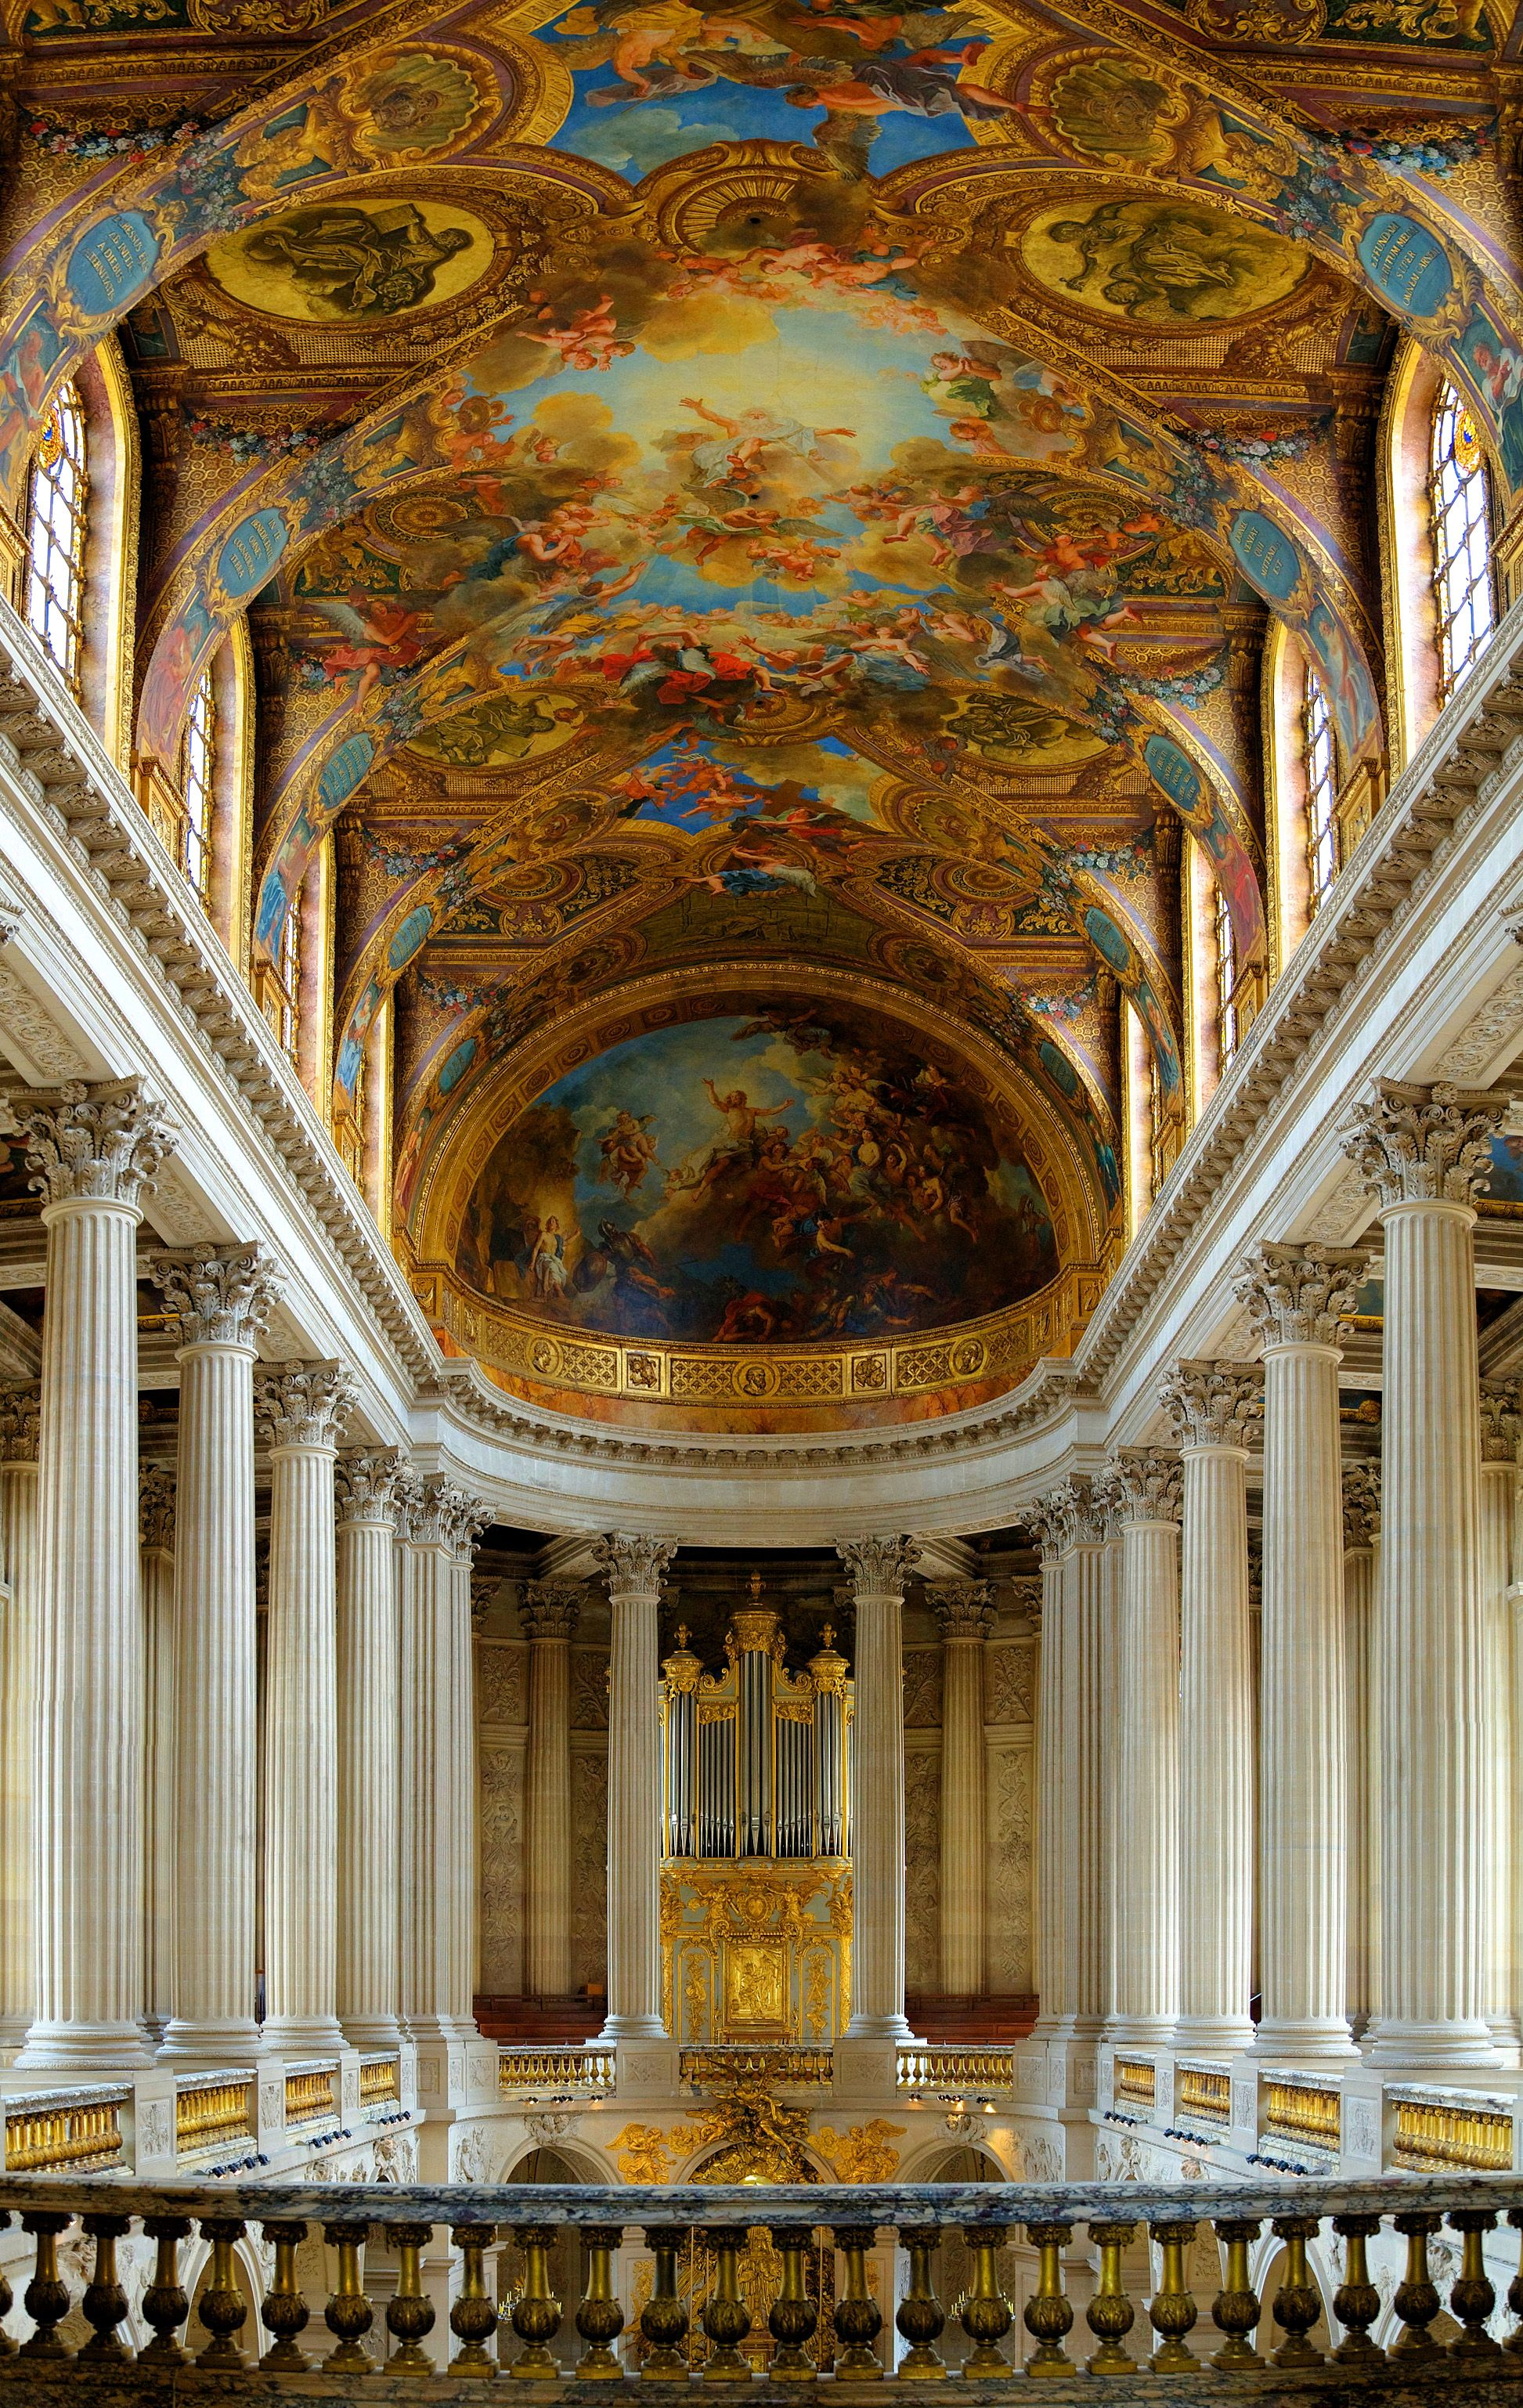 Best Kitchen Gallery: European Baroque Baroque Architecture Versailles And Architecture of Baroque Architecture Versailles on rachelxblog.com